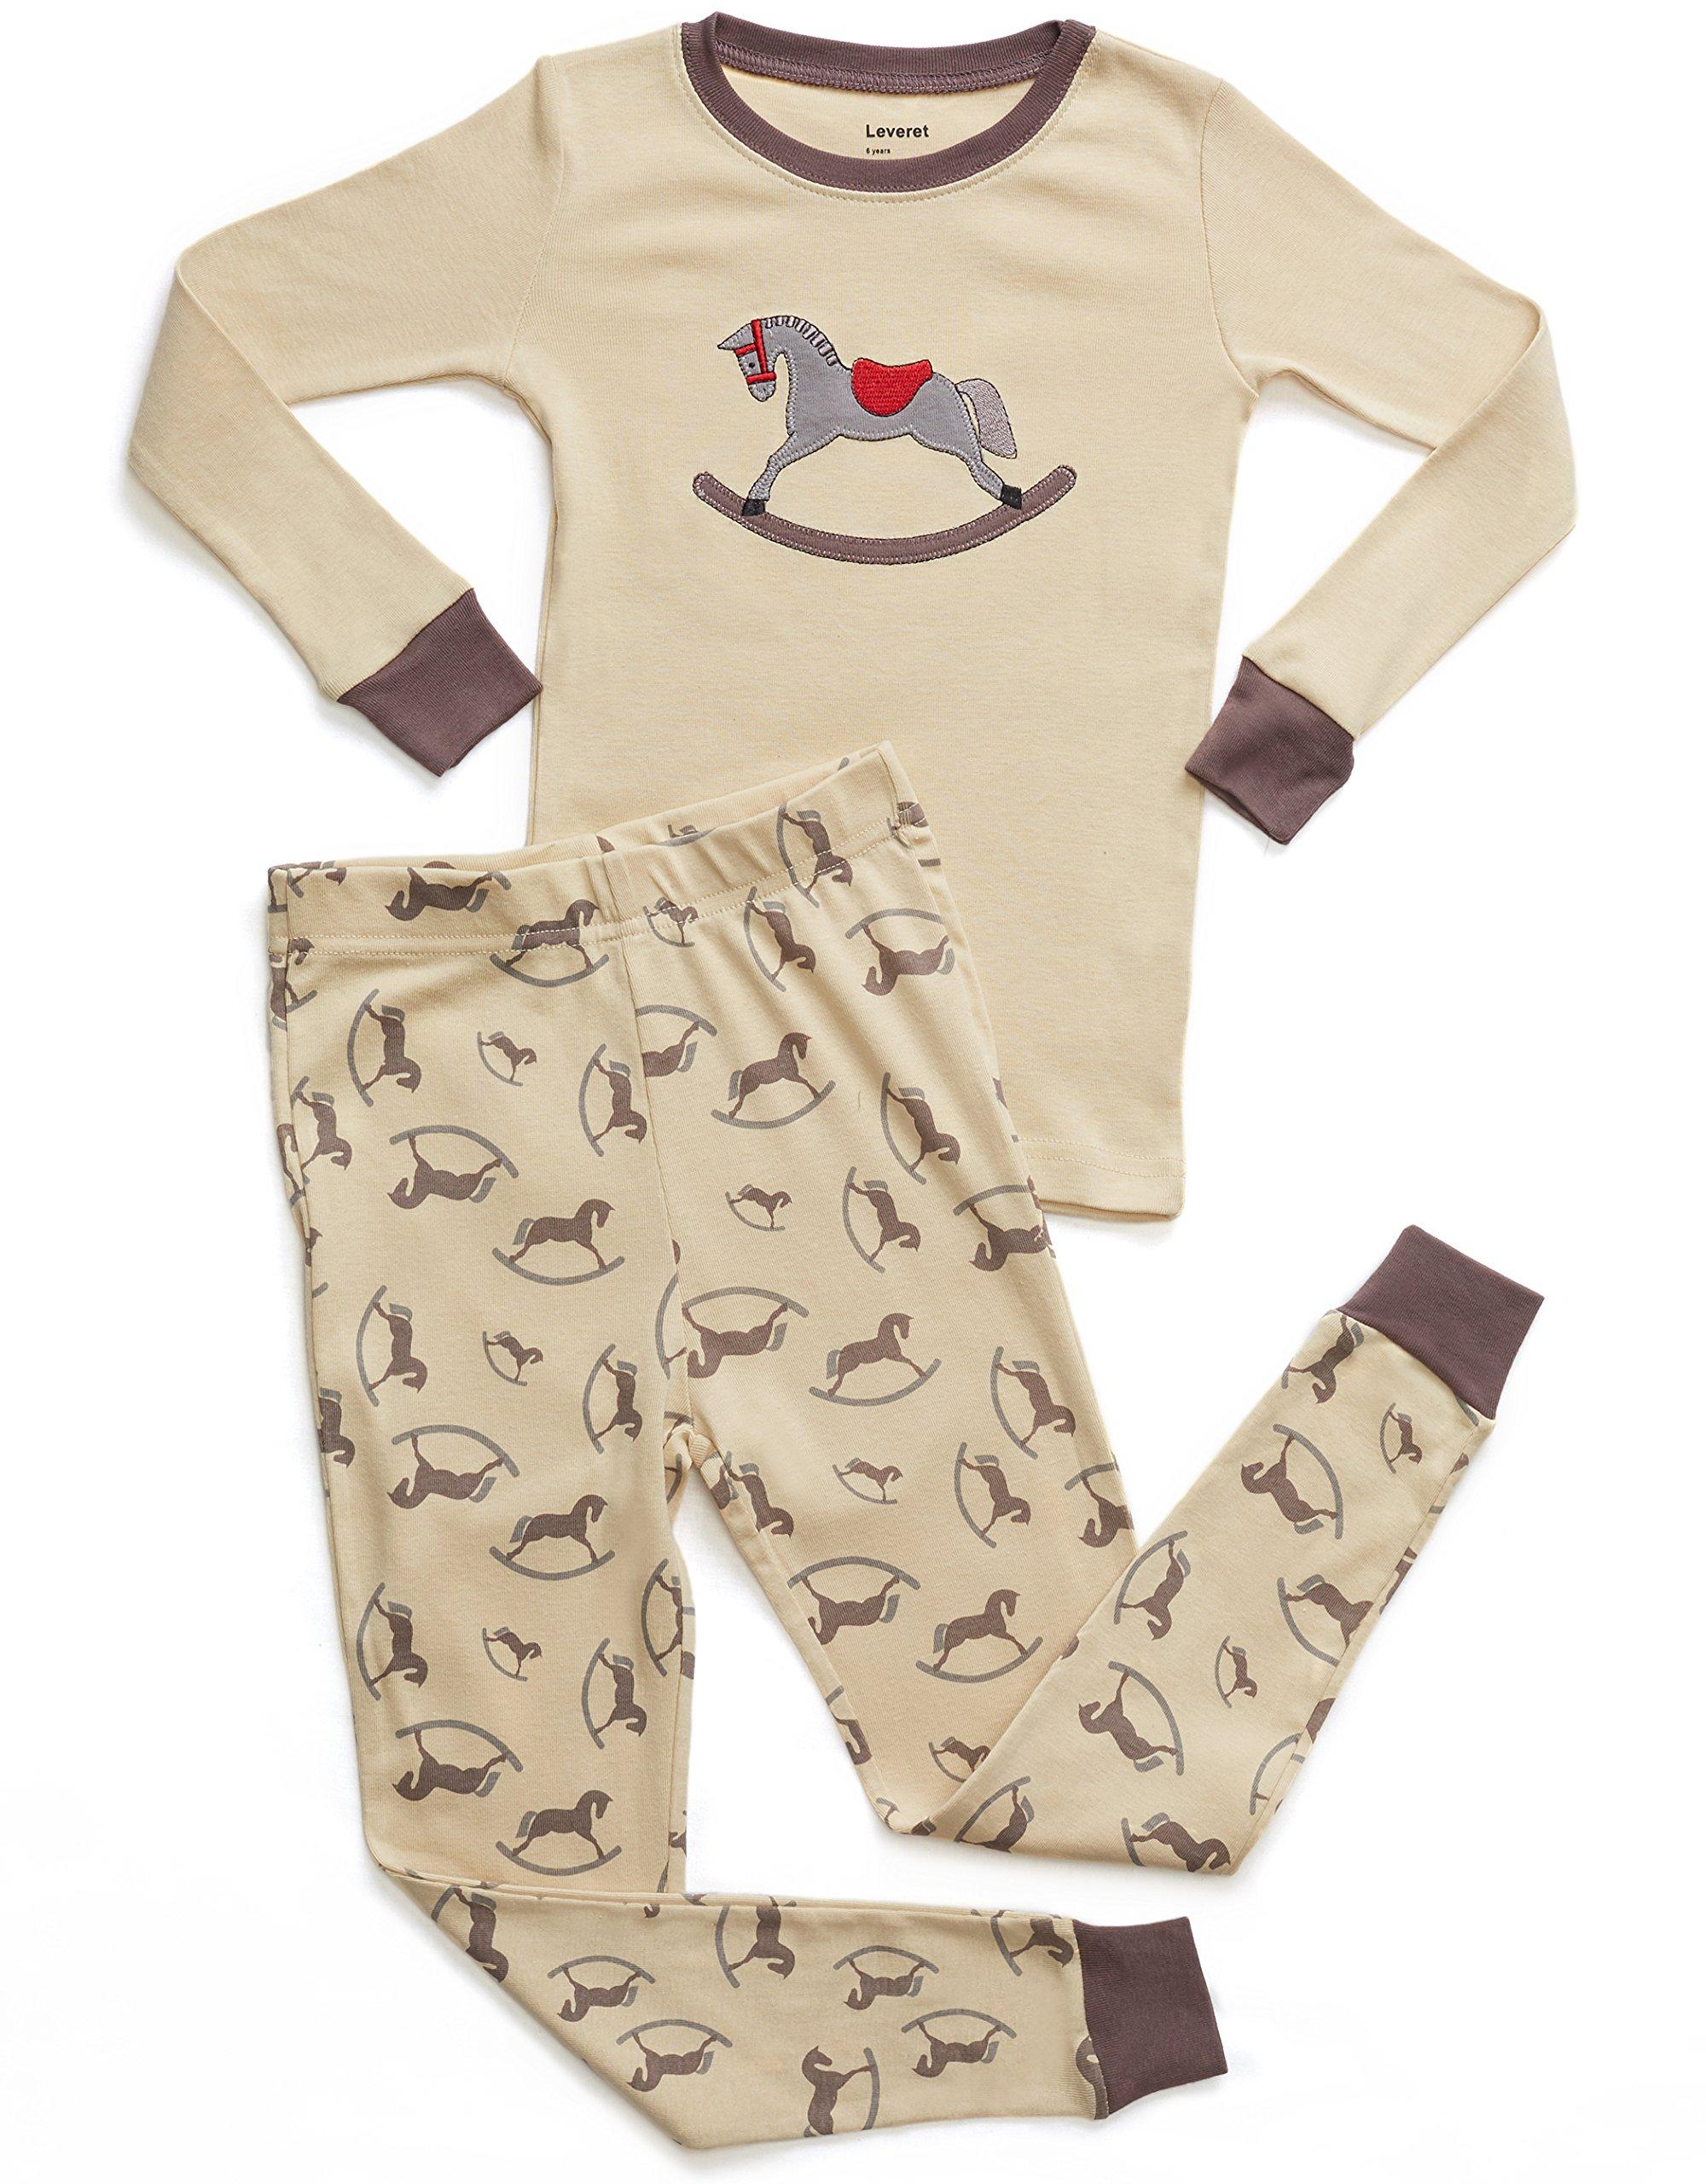 12 Months-14 Years Leveret Kids /& Toddler Horse Bird Girls Pajamas 2 Piece Pjs Set 100/% Cotton Sleepwear